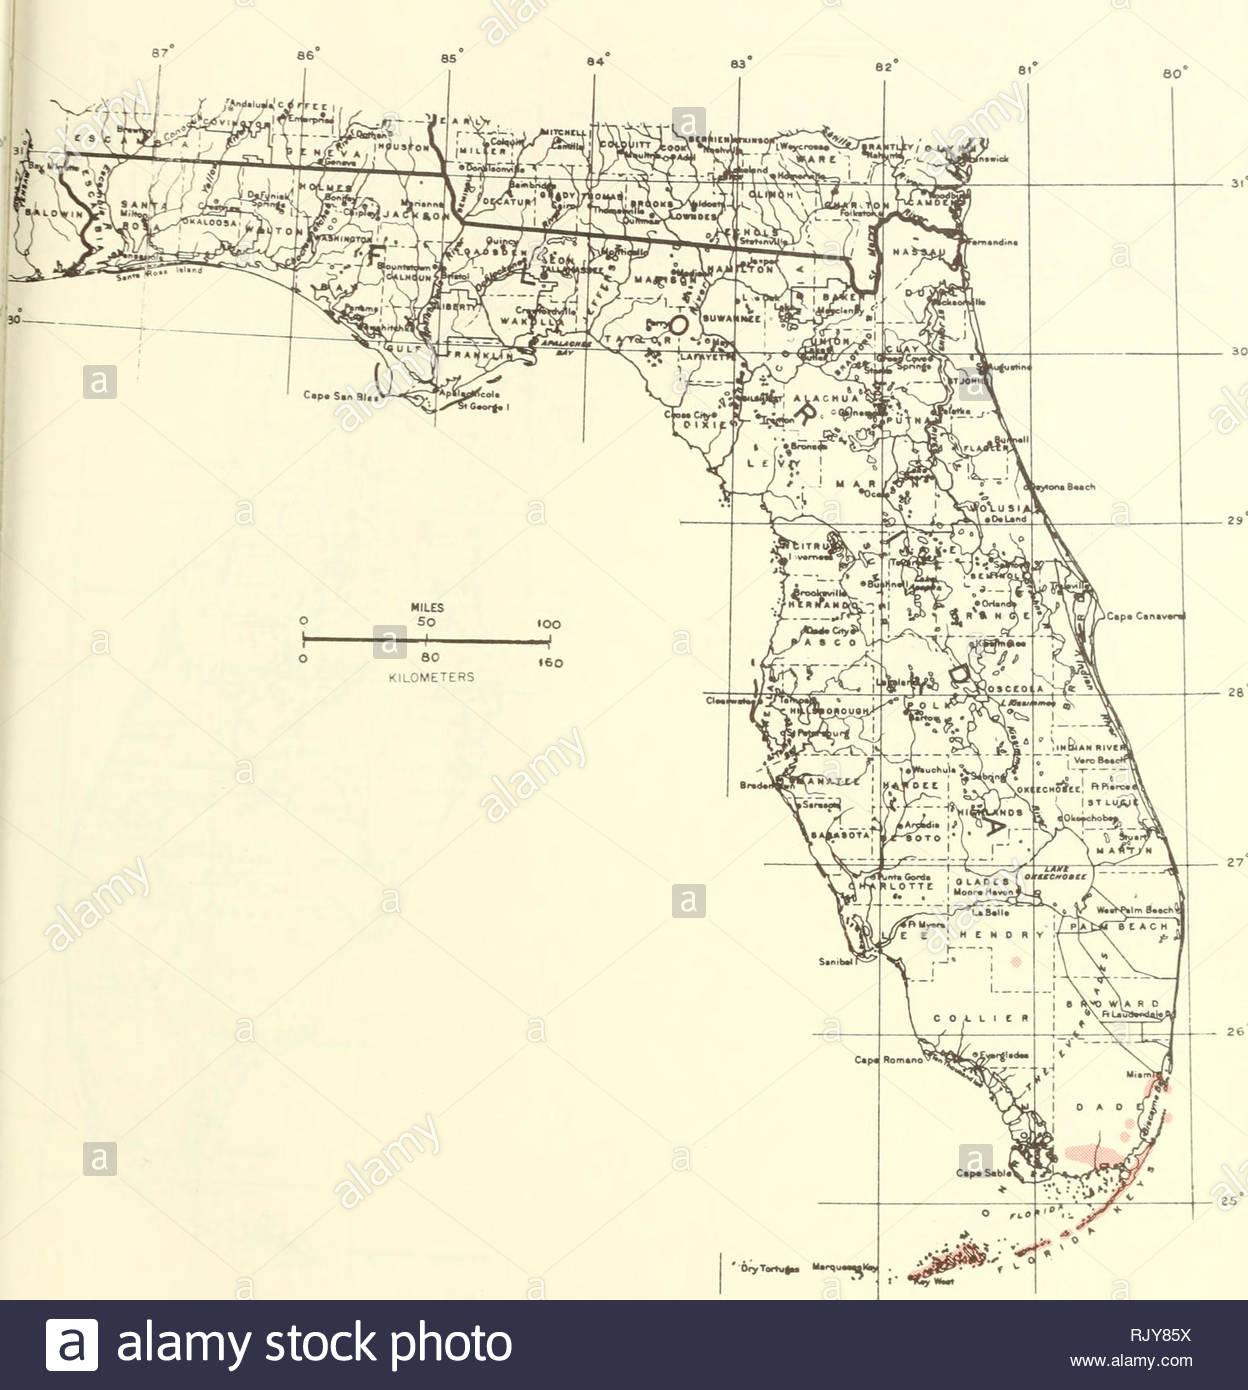 Atlas Of United States Trees: Volume 5. Florida. Trees. Map 174 - Florida Pollen Map